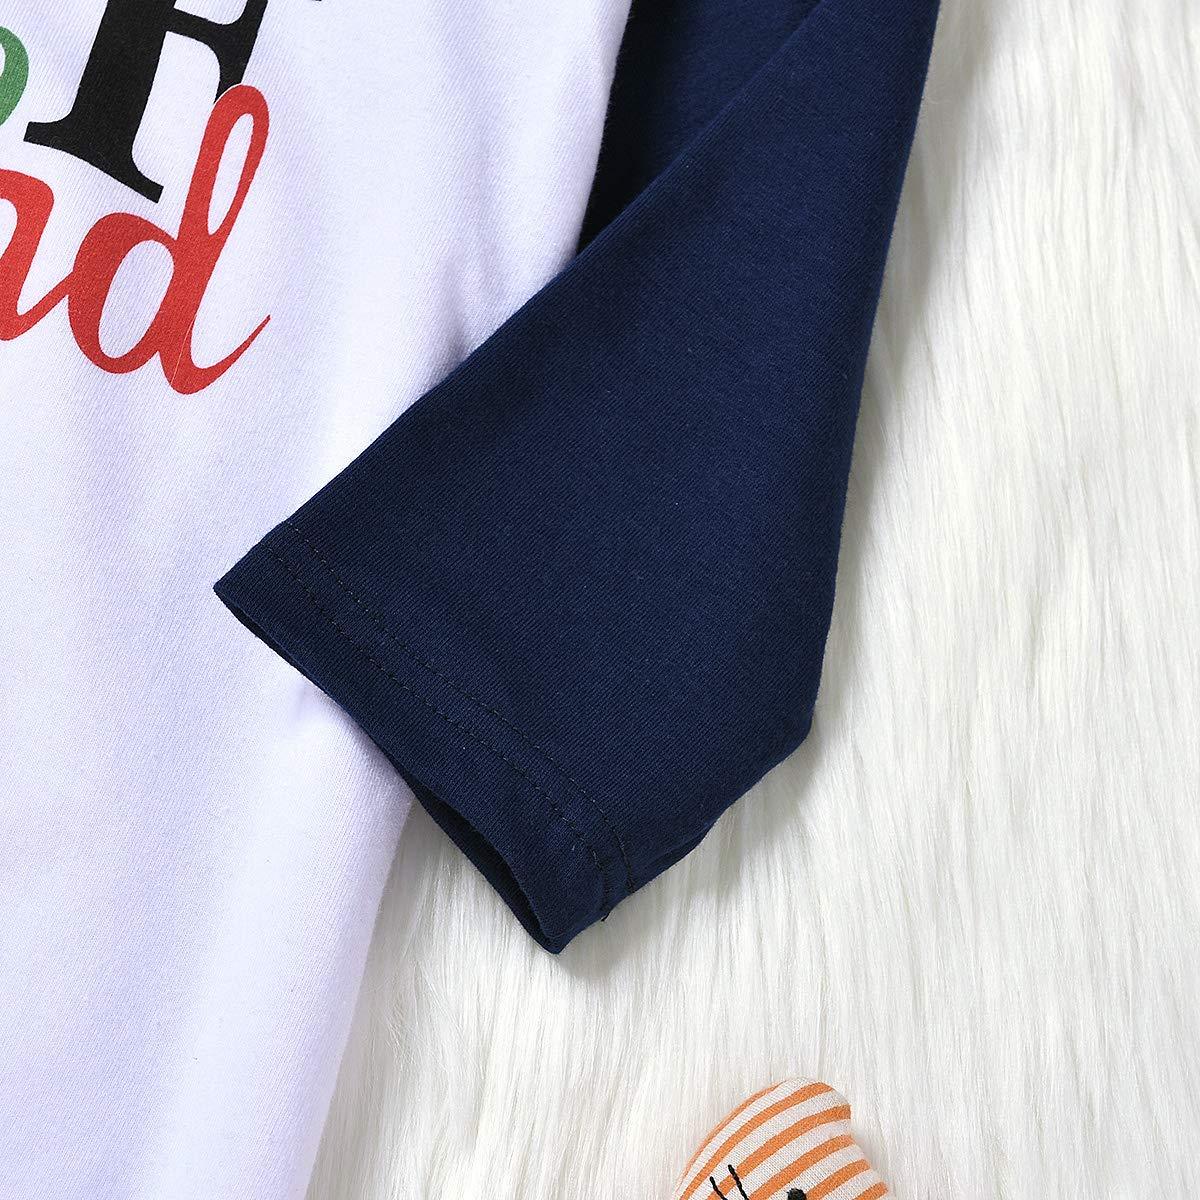 puseky Parent-Child Dad Mom Baby Kids Family Matching Christmas Pajamas Sleepwear Homewear Set